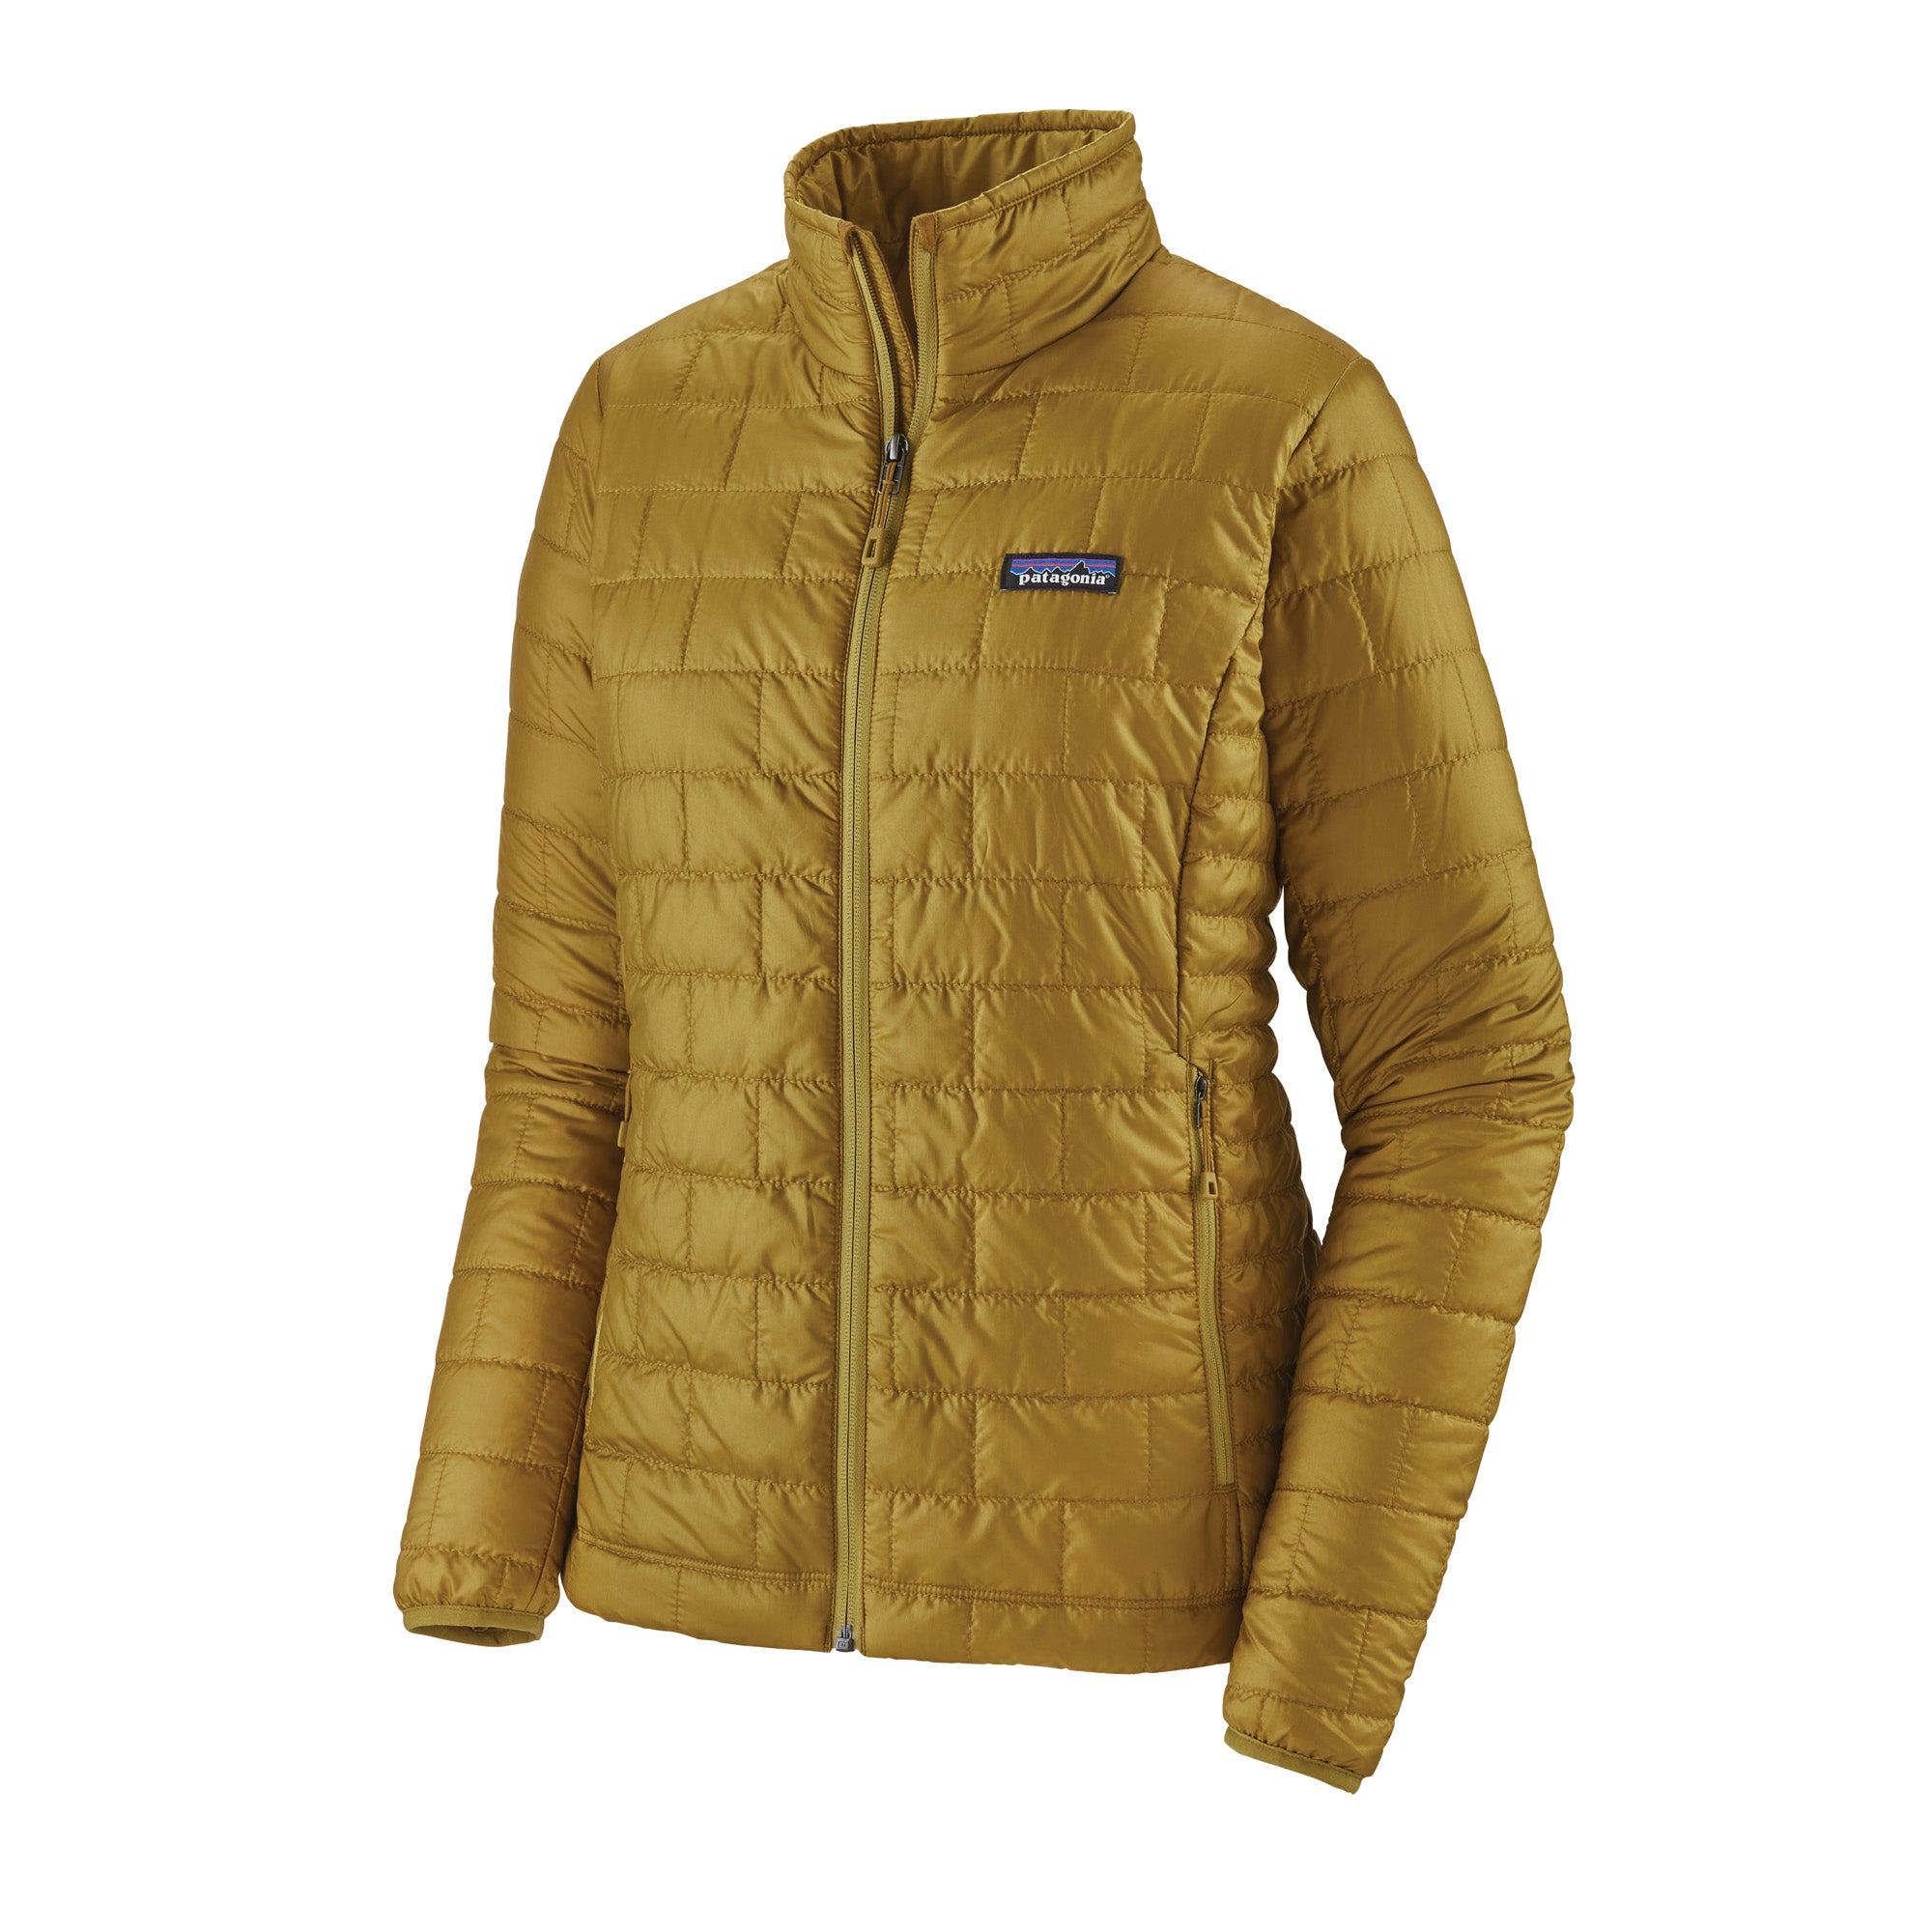 2021 Patagonia Nano Puff Jacket